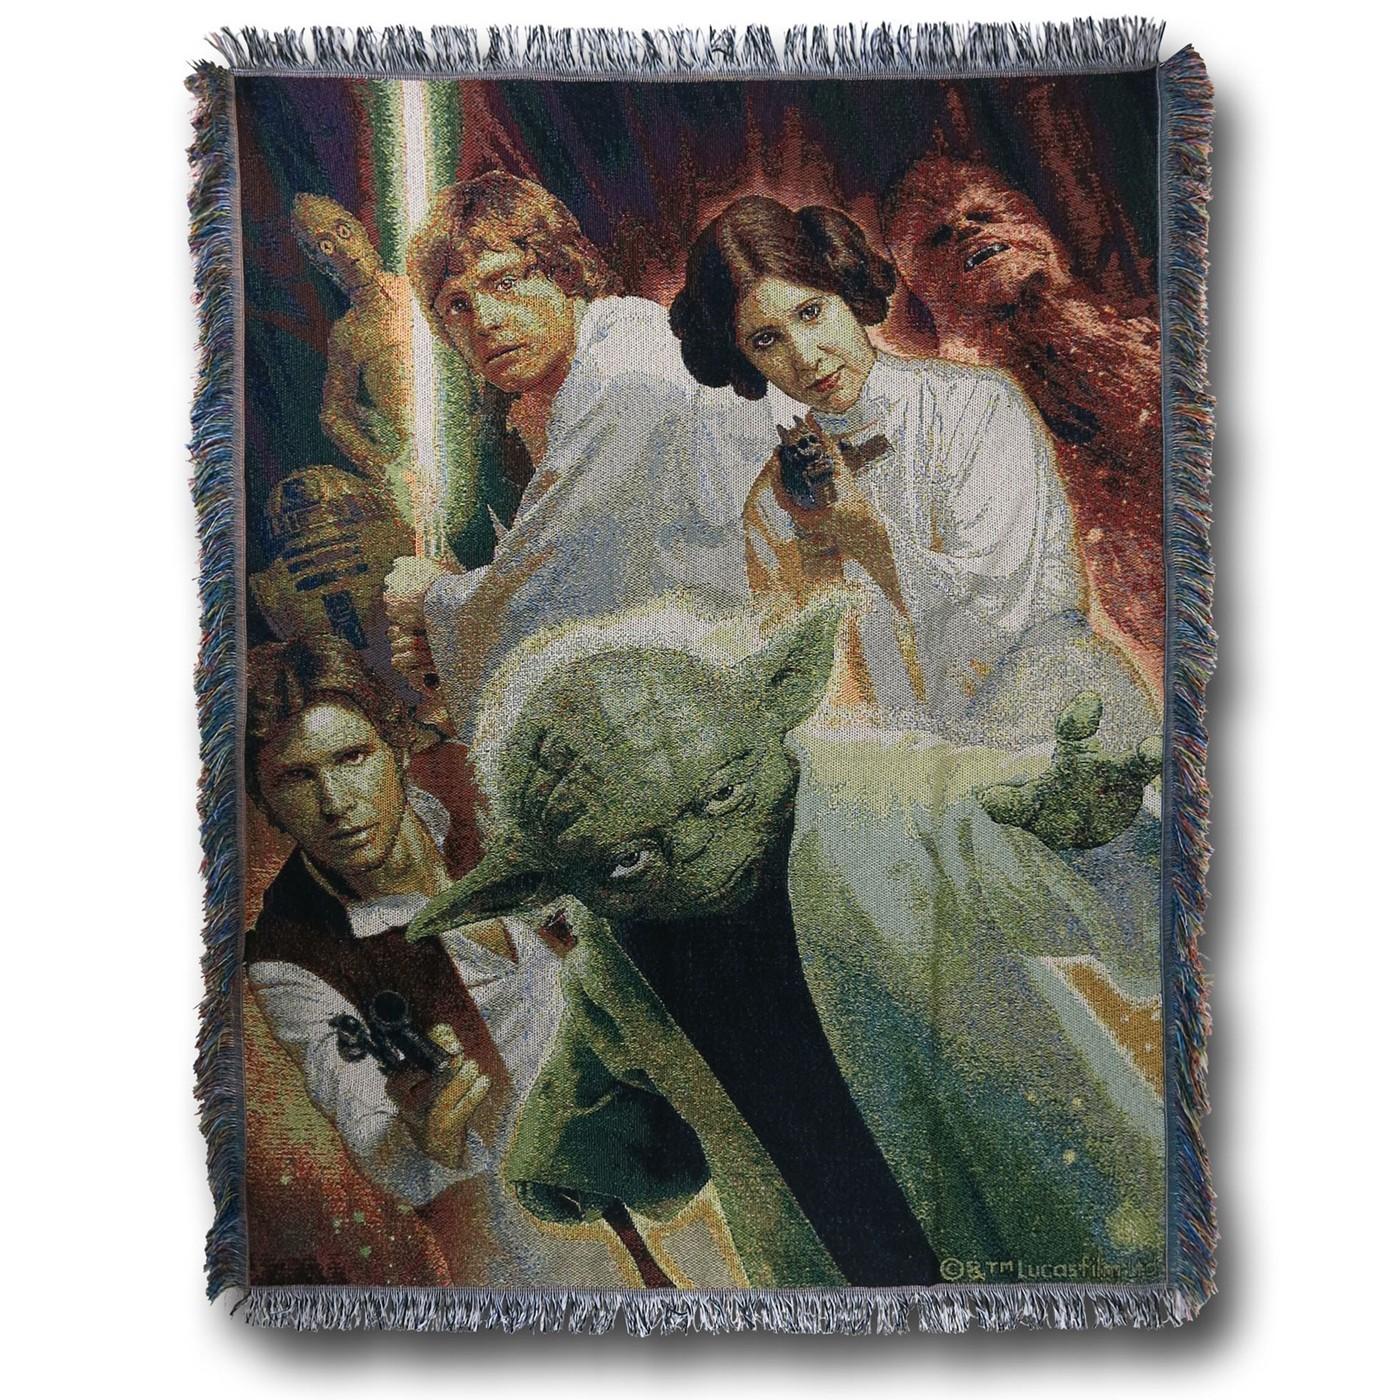 Star Wars Rebel Force Tapestry Throw